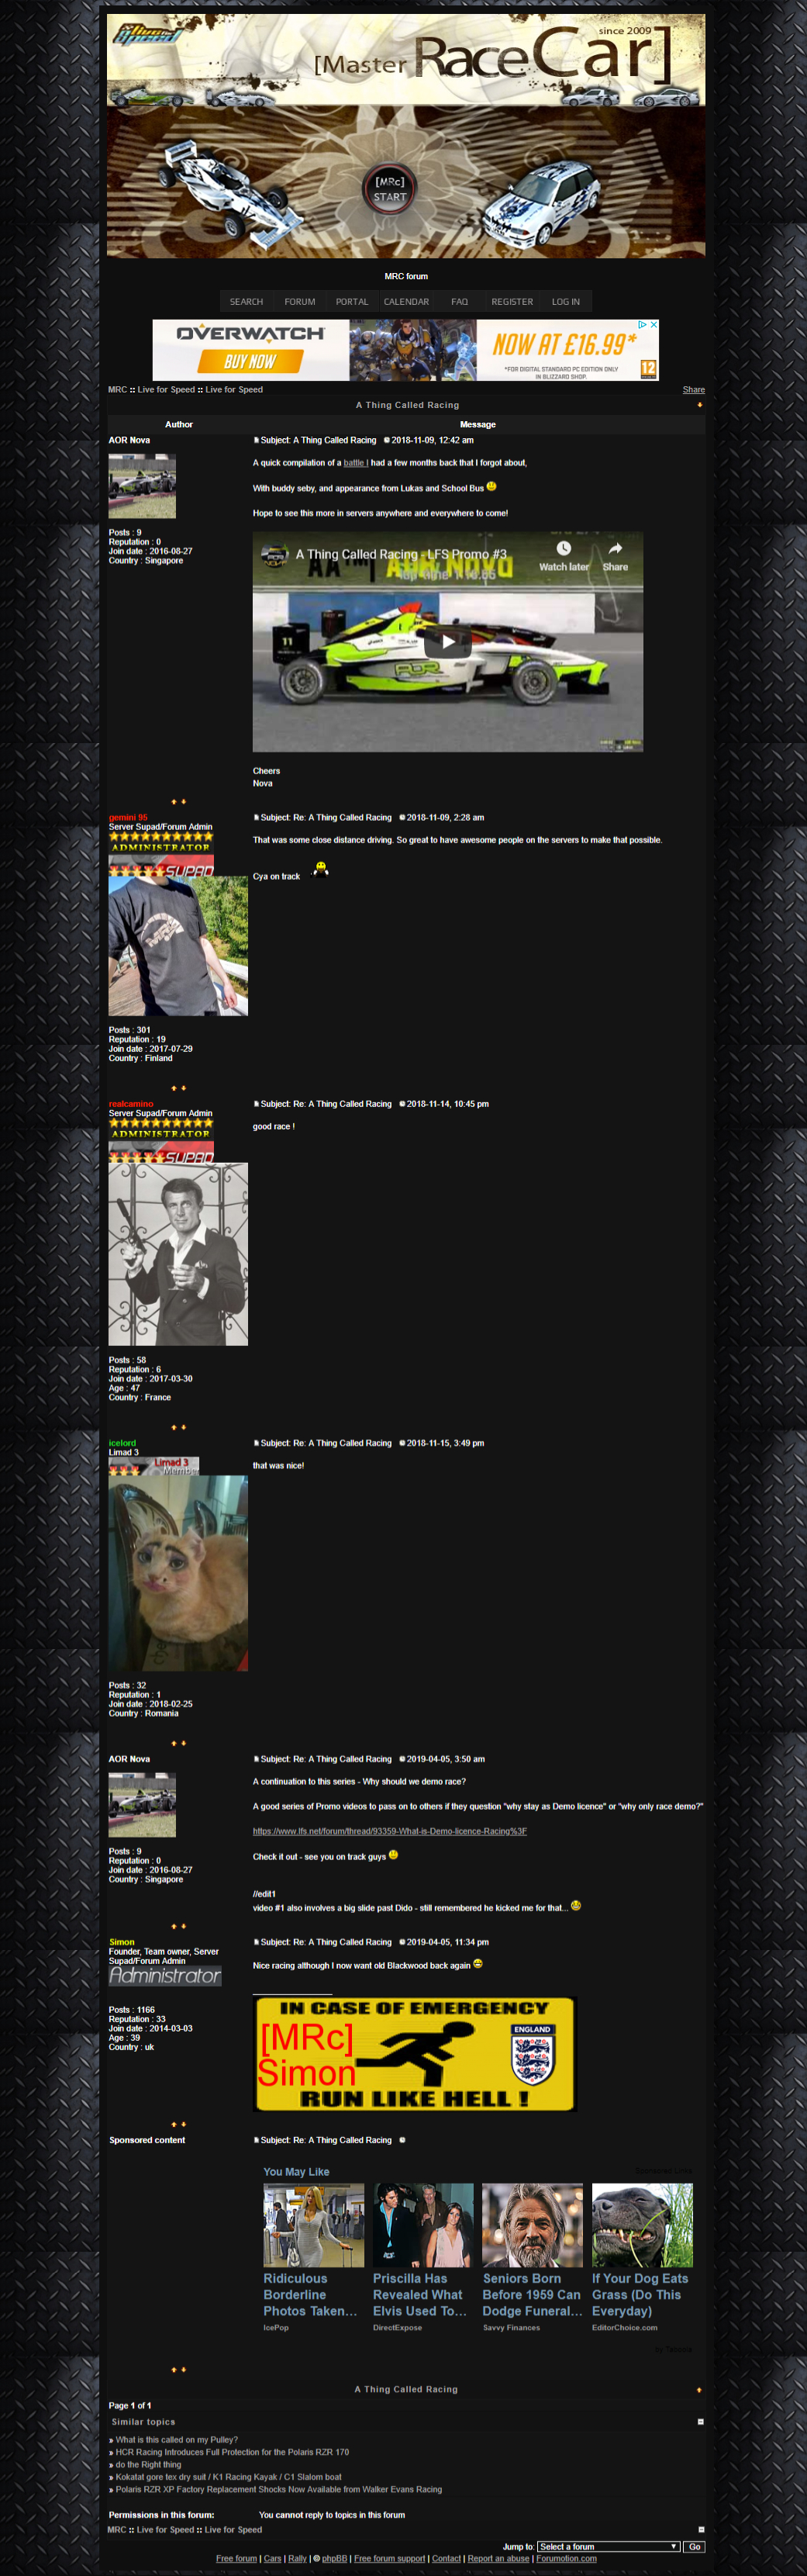 [Image: screencapture-masterracecar-forumactif-t...-11-10.jpg]